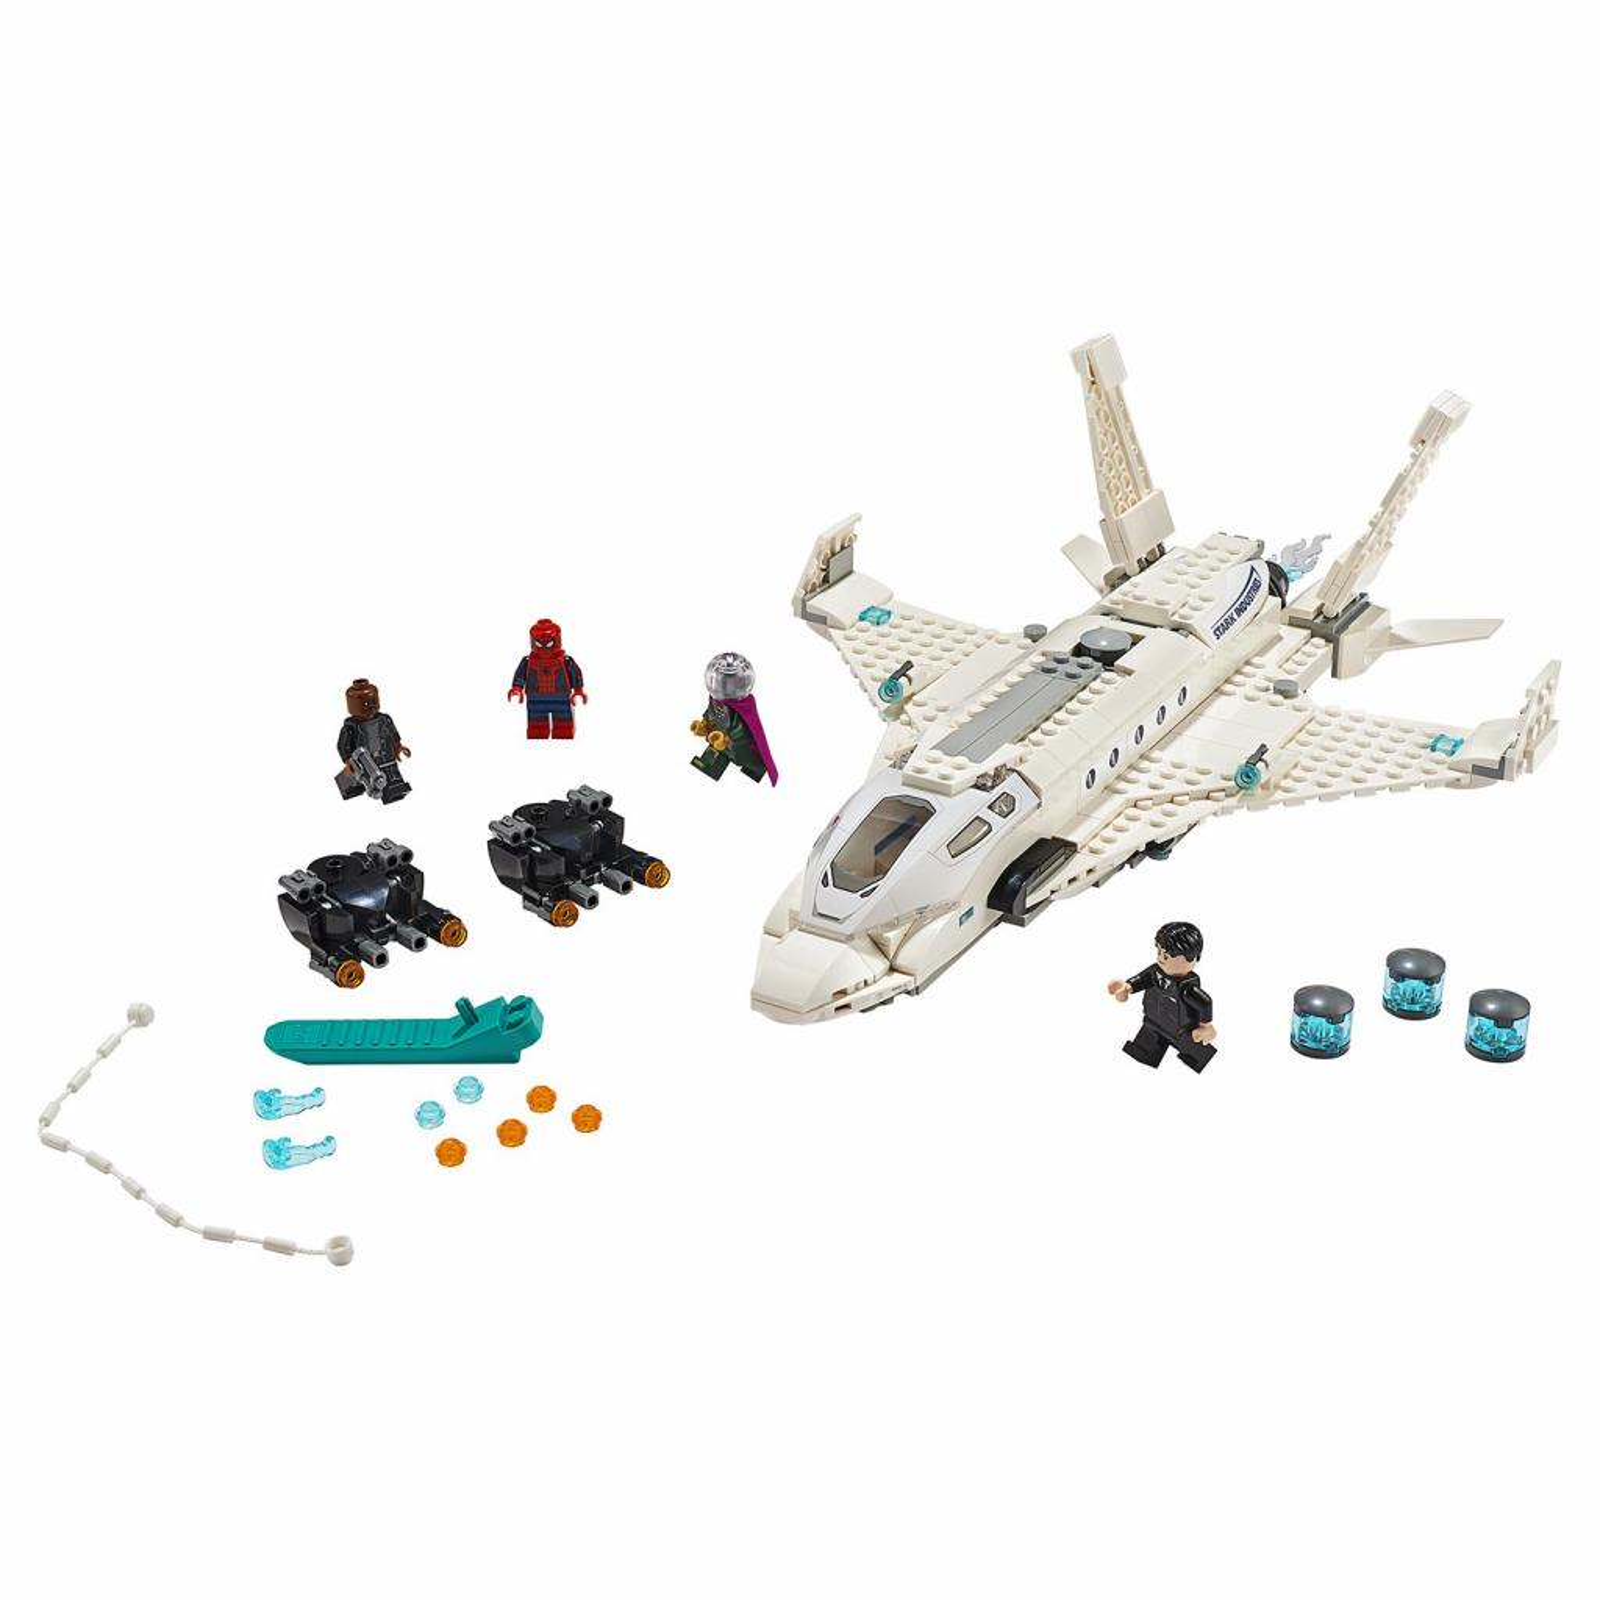 Конструктор LEGO Super Heroes Реактивный самолёт Старка и атака дрона (76130) изображение 2